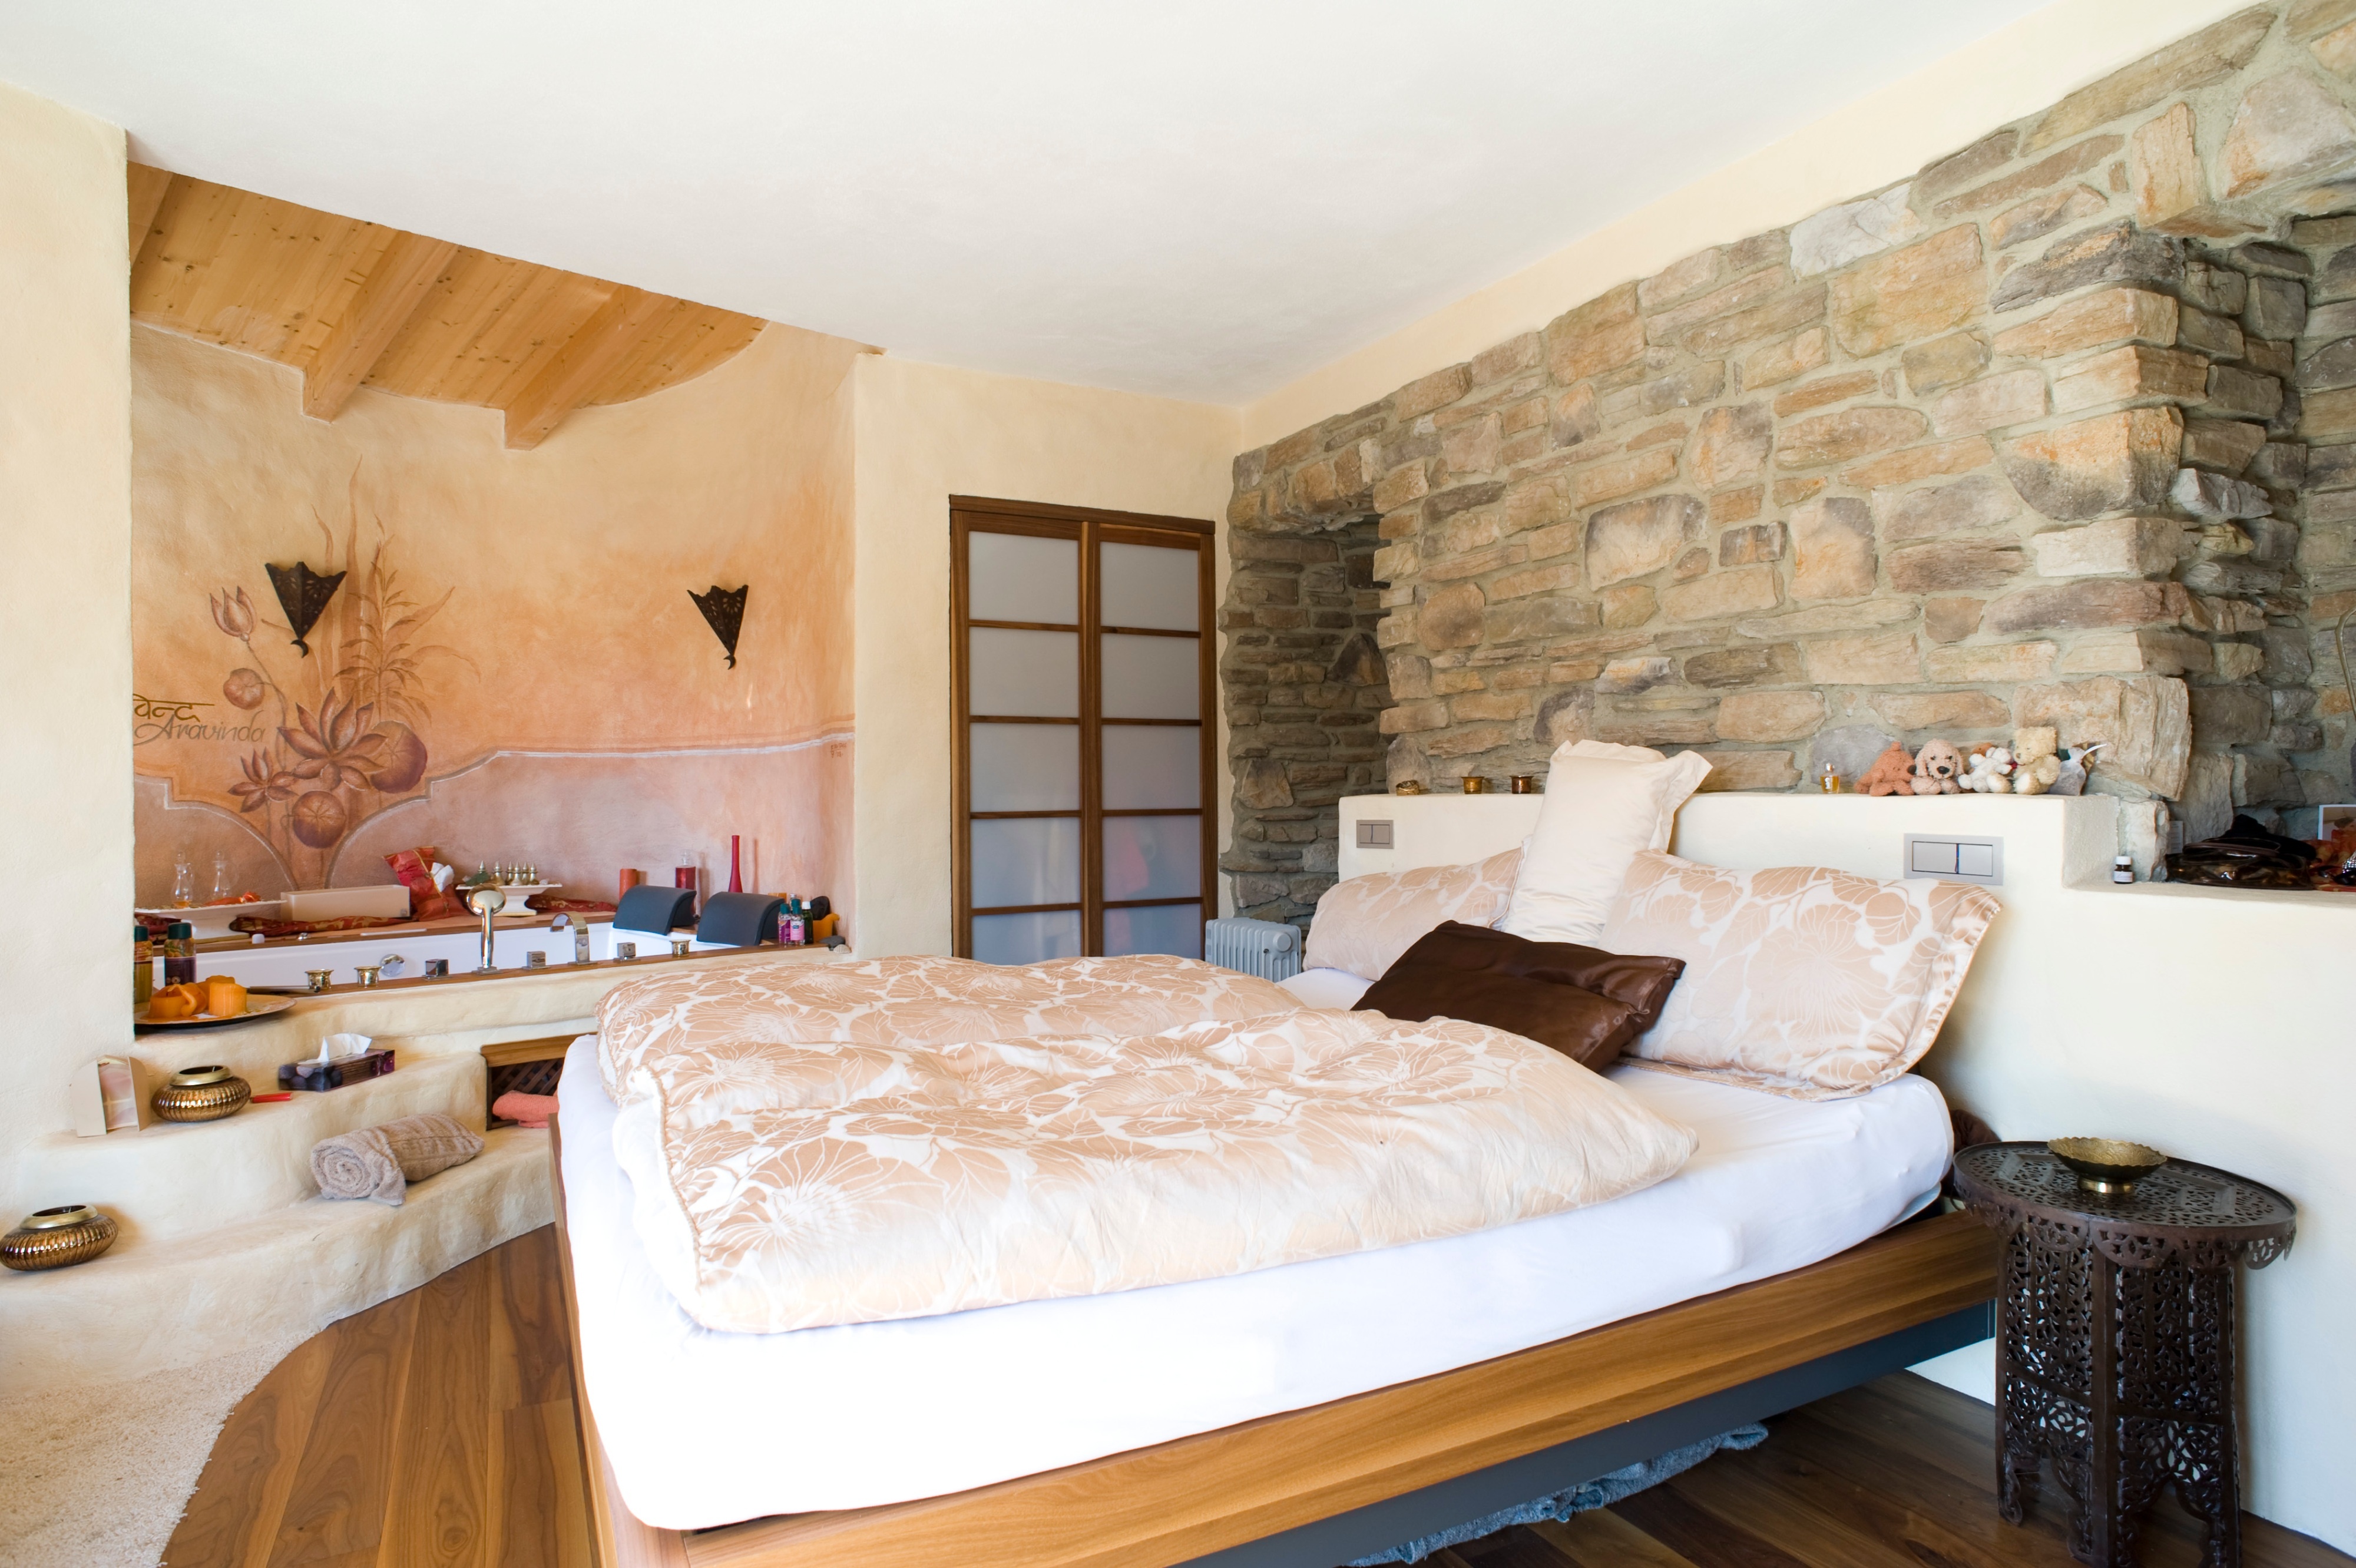 Germany Listing – Luxus-Villa, 150m², Whirlpool, Sauna 1